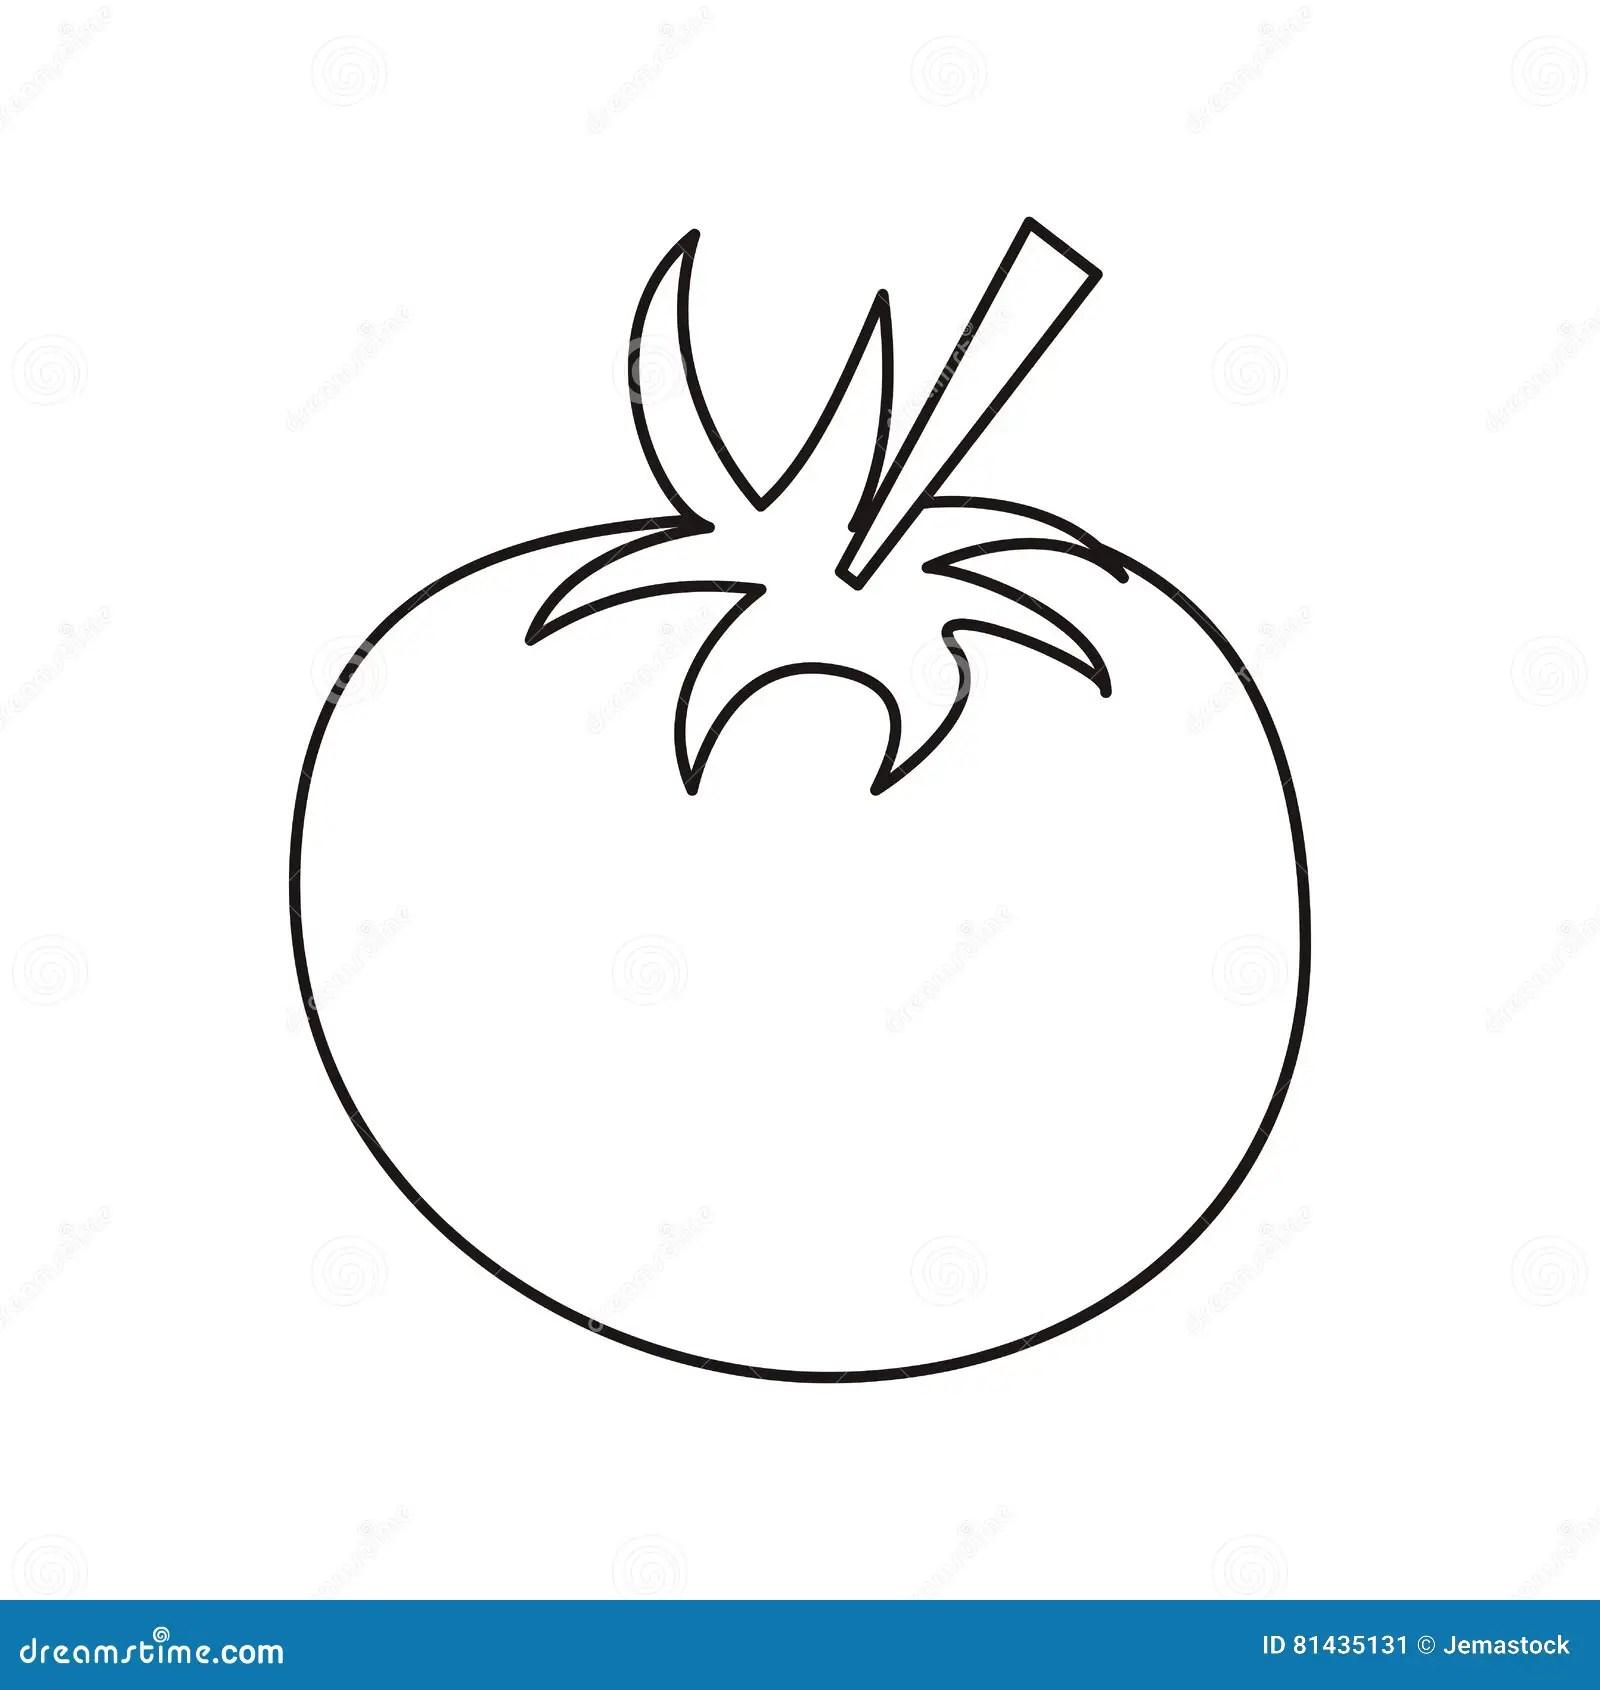 Outline Tomato Juicy Vegetable Icon Stock Vector